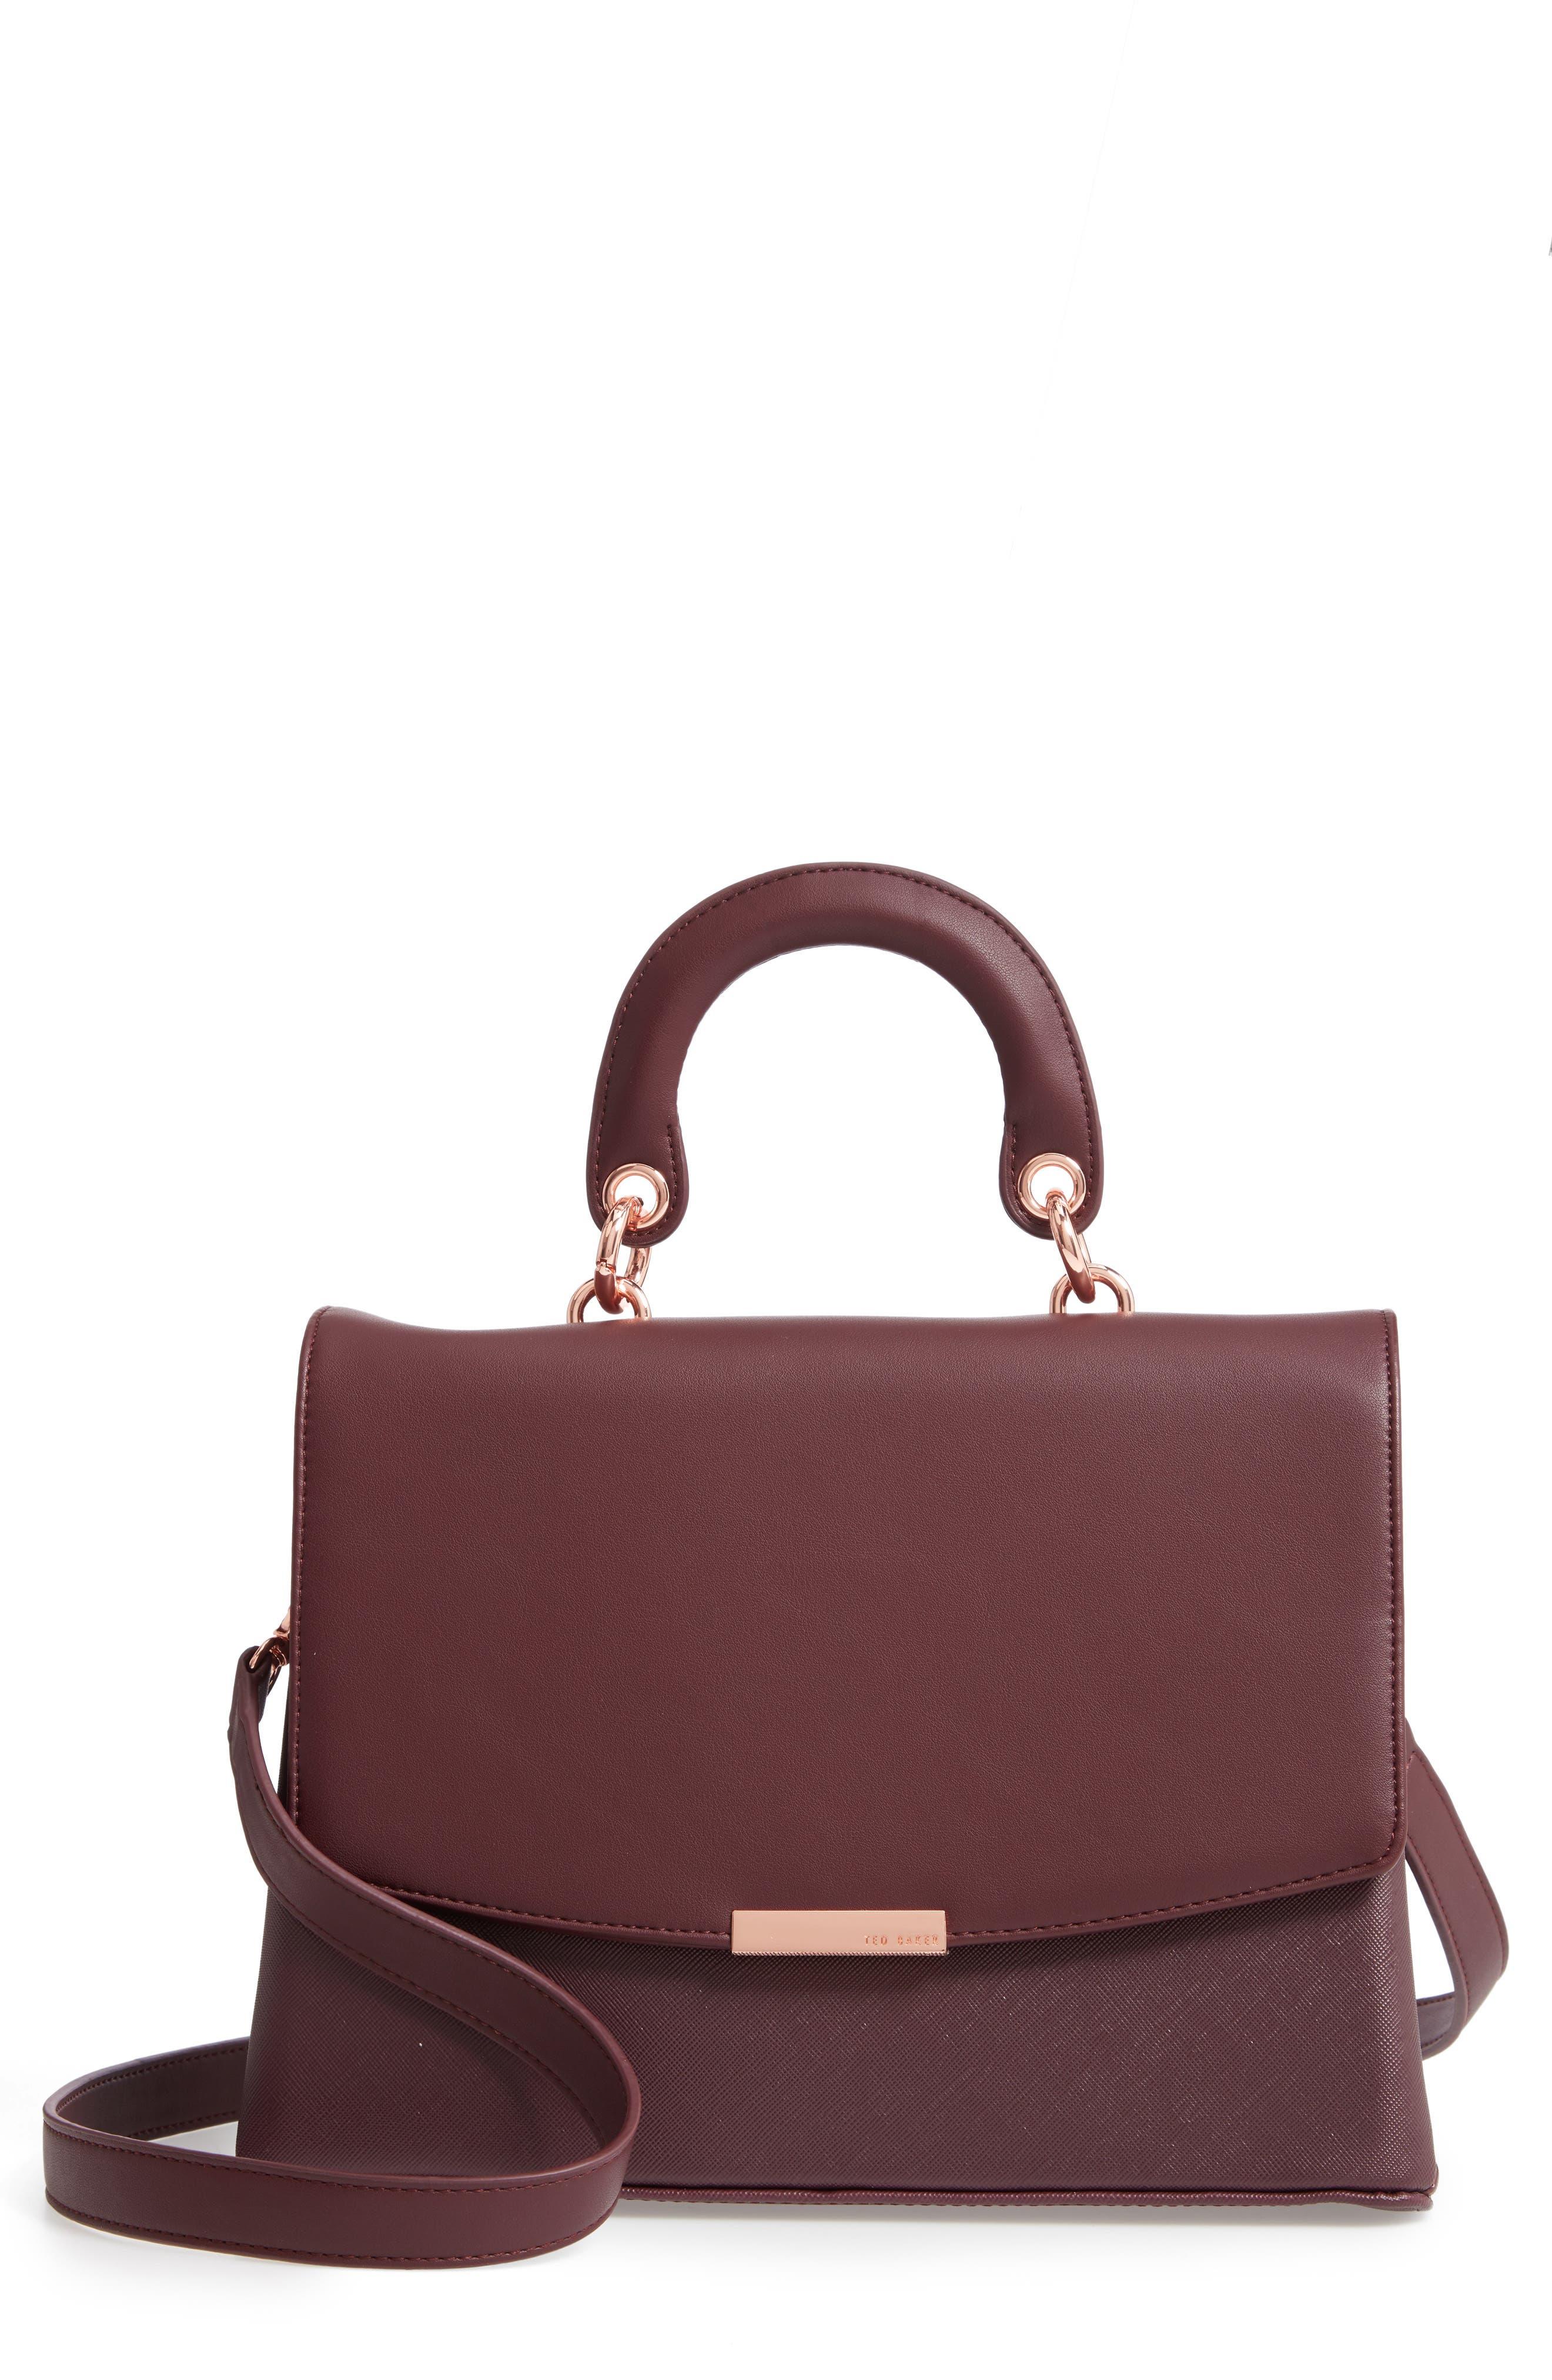 Keiira Lady Bag Faux Leather Top Handle Satchel,                         Main,                         color, DEEP PURPLE